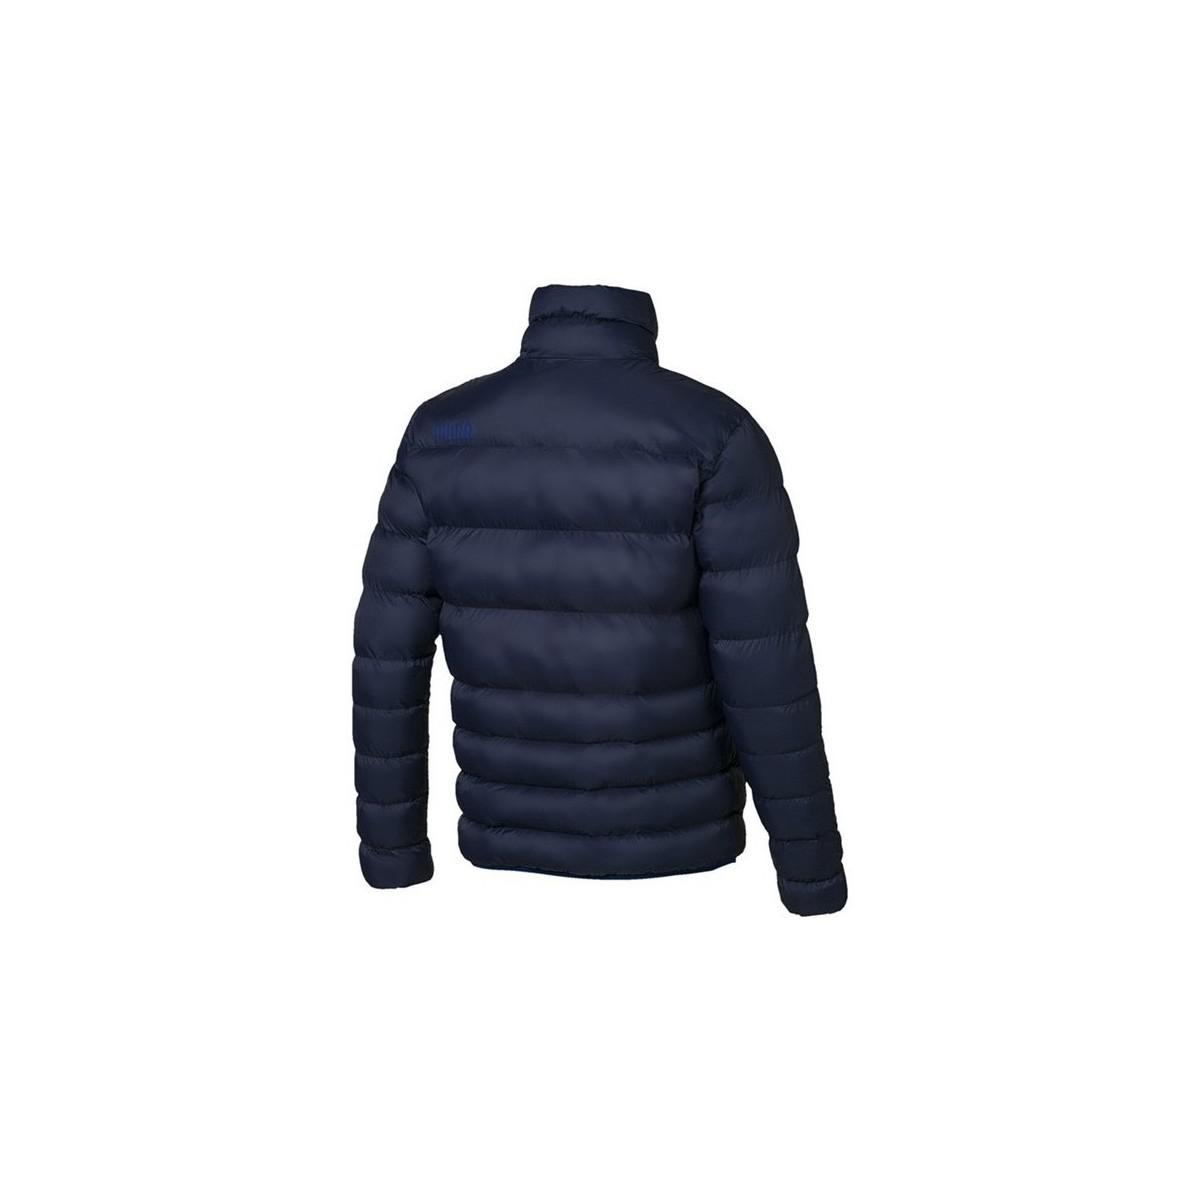 ec5225ece315 PUMA Warmcell Ultralight Ad Men s Jacket In Multicolour in Blue for ...